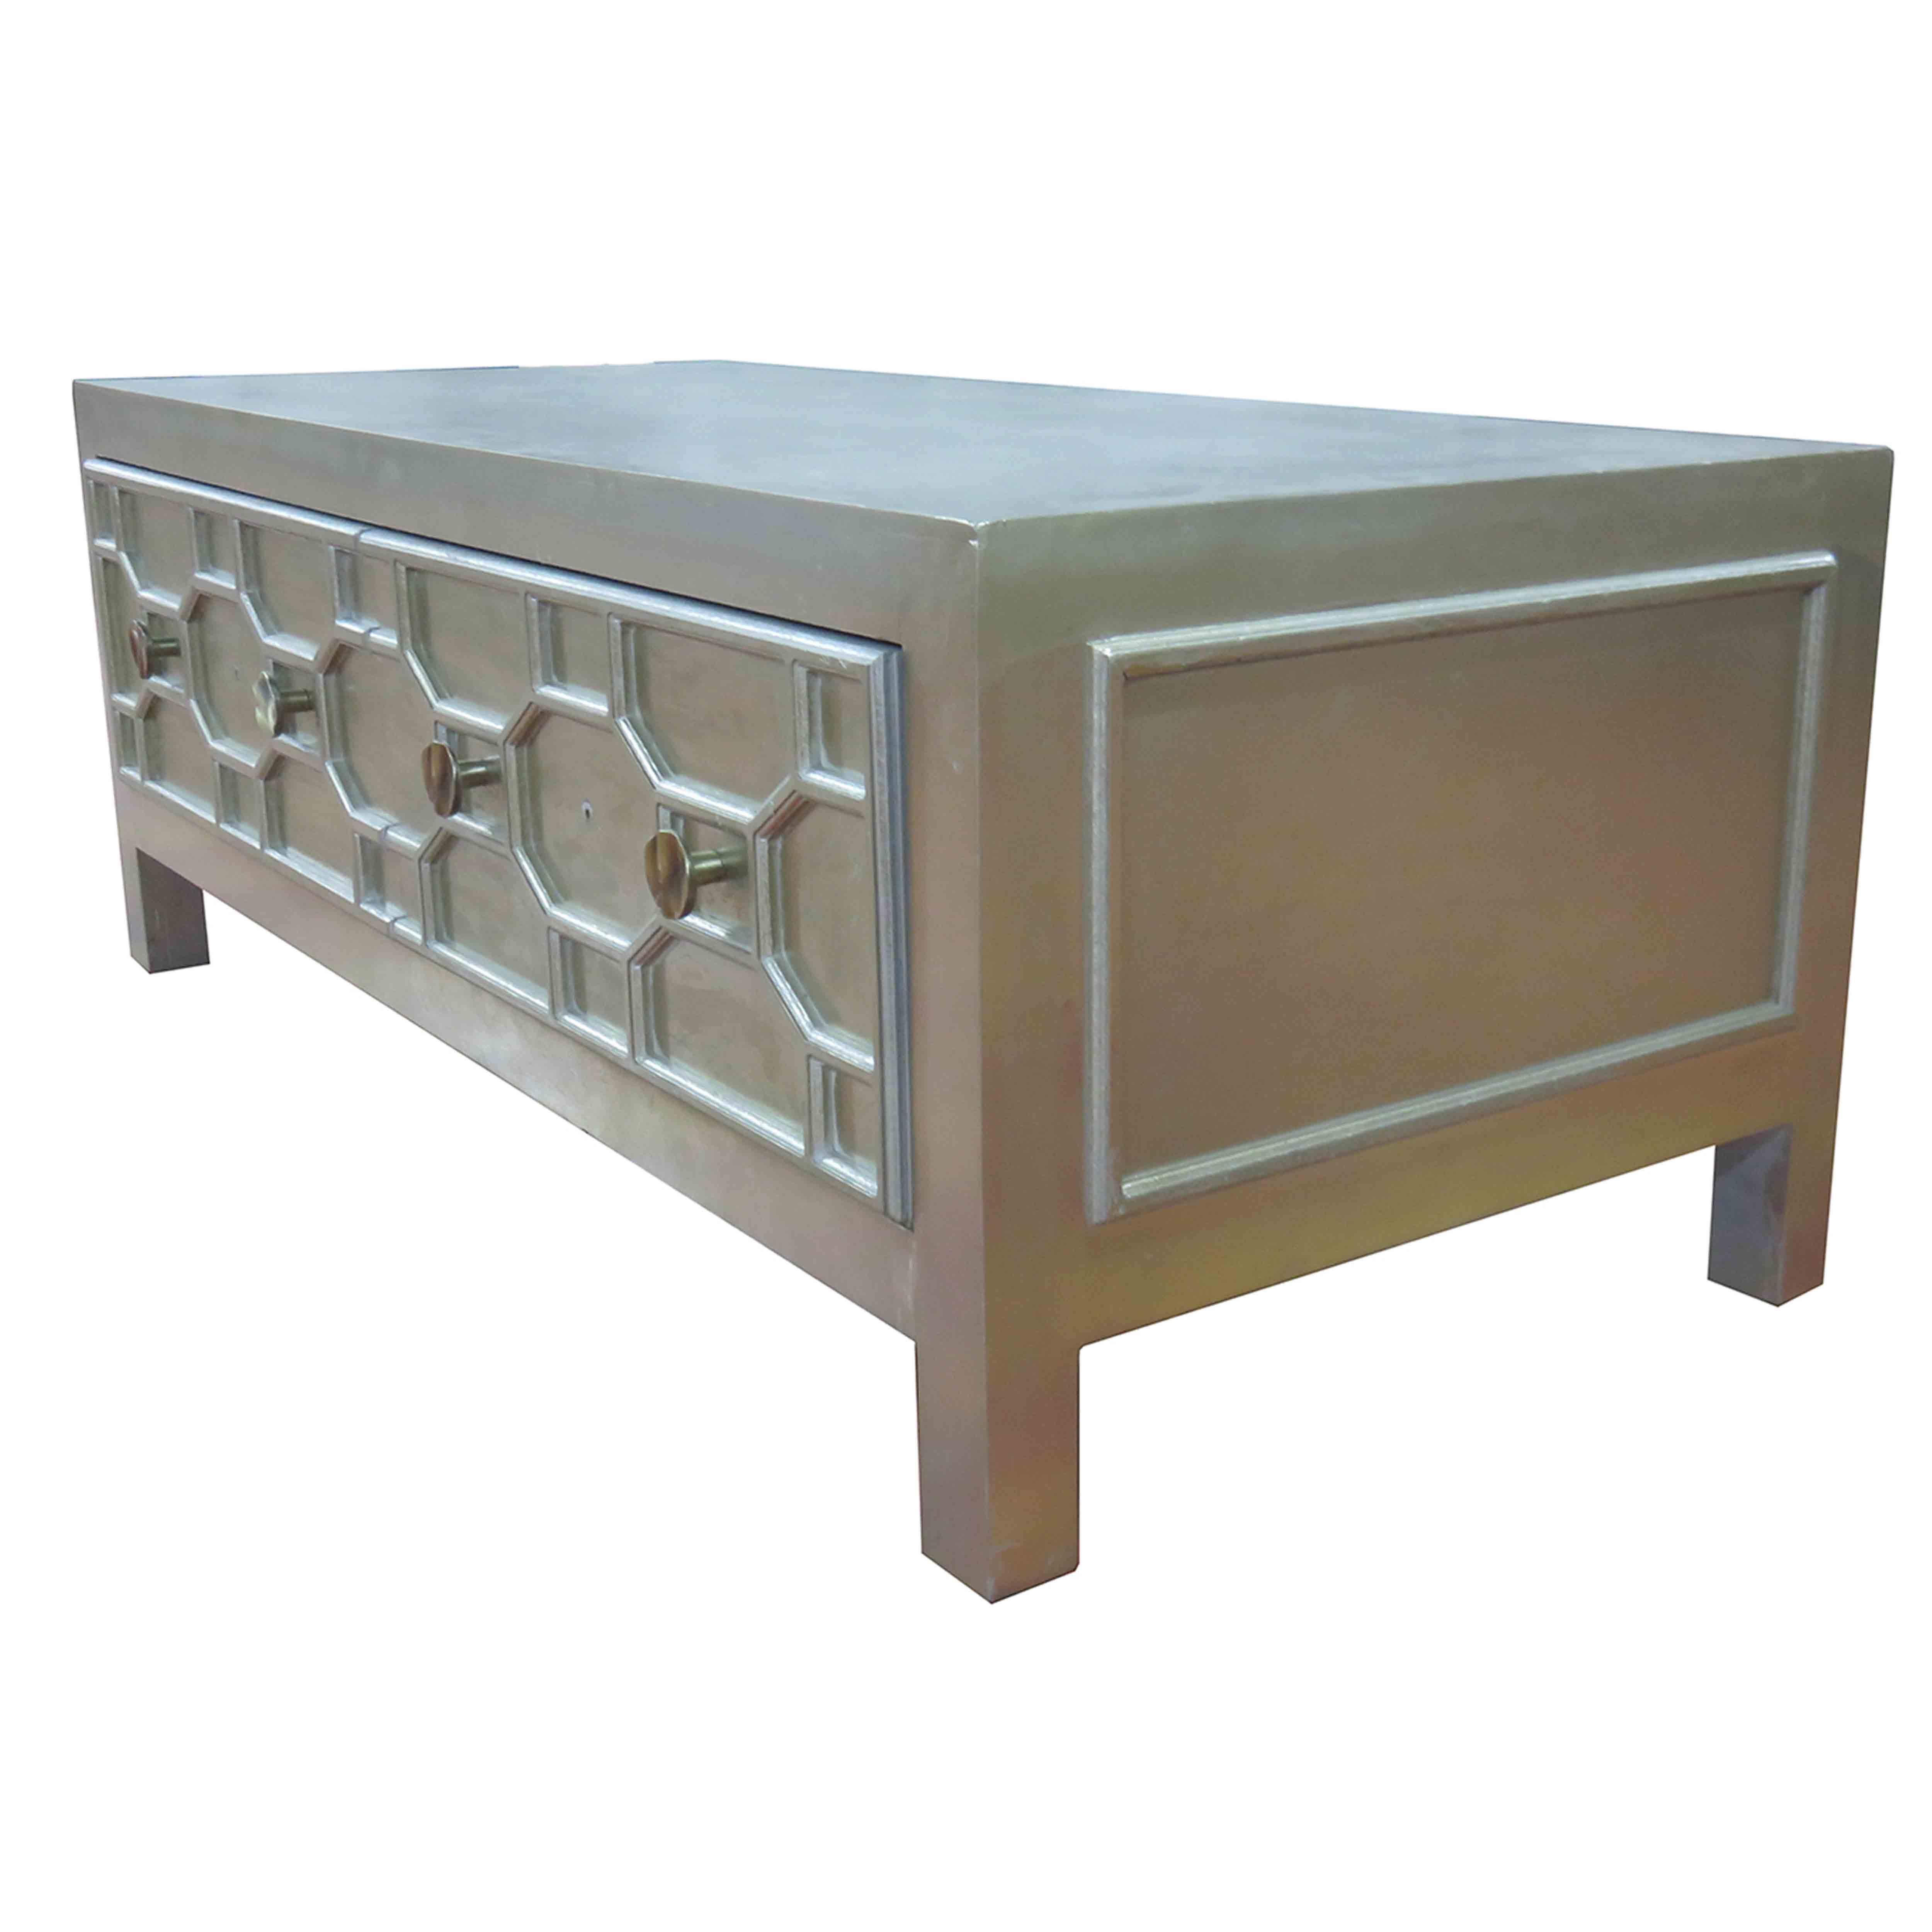 2100002 ac npd furniture stylish affordable lifestyle